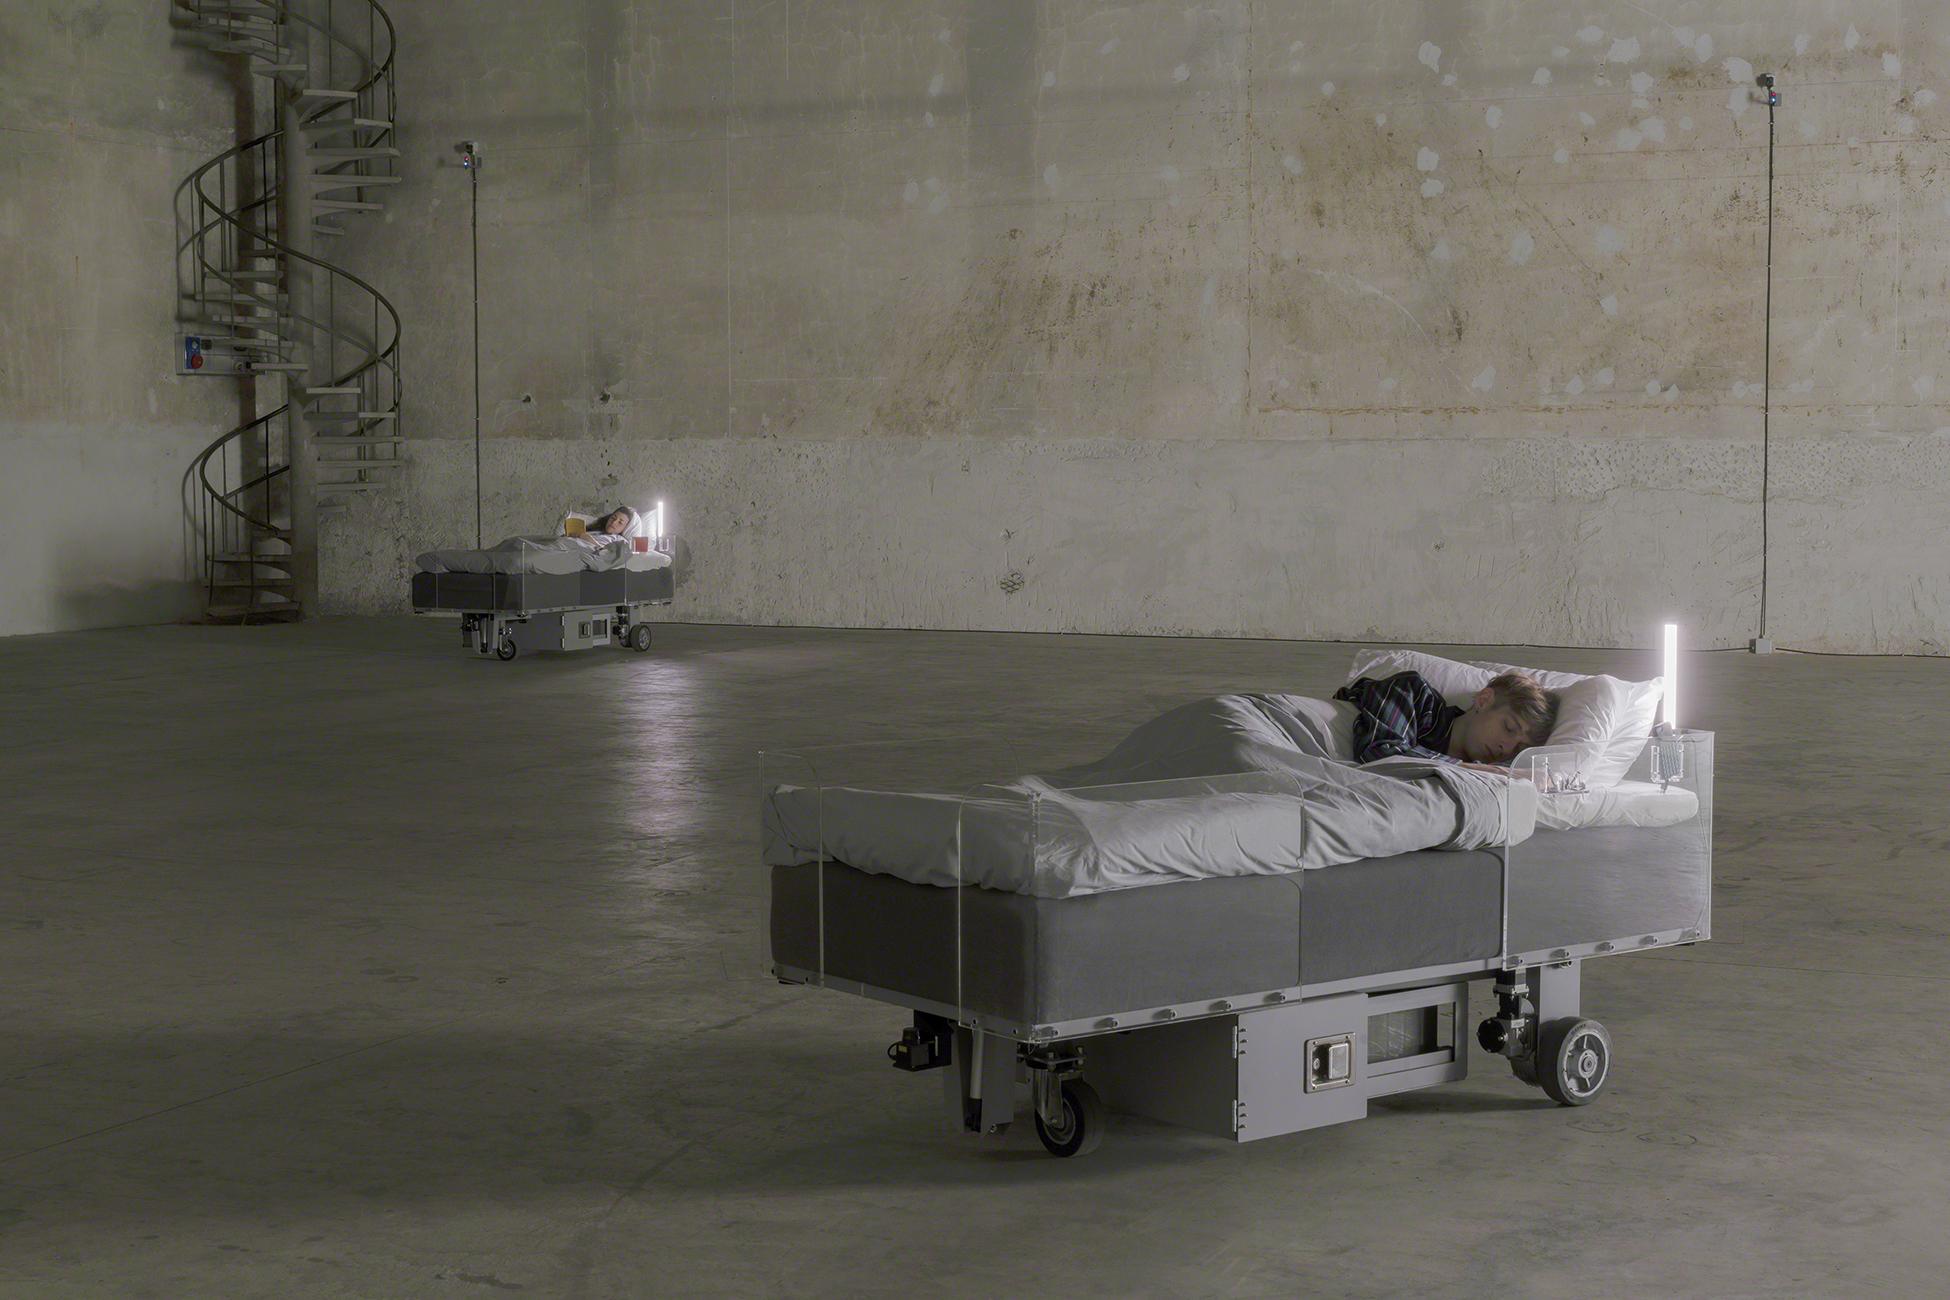 Carsten Höller, Two Roaming Beds (Grey), 2015 (Courtesy of the artist and Pirelli HangarBicocca, Milan. Photo: © Attilio Maranzano)